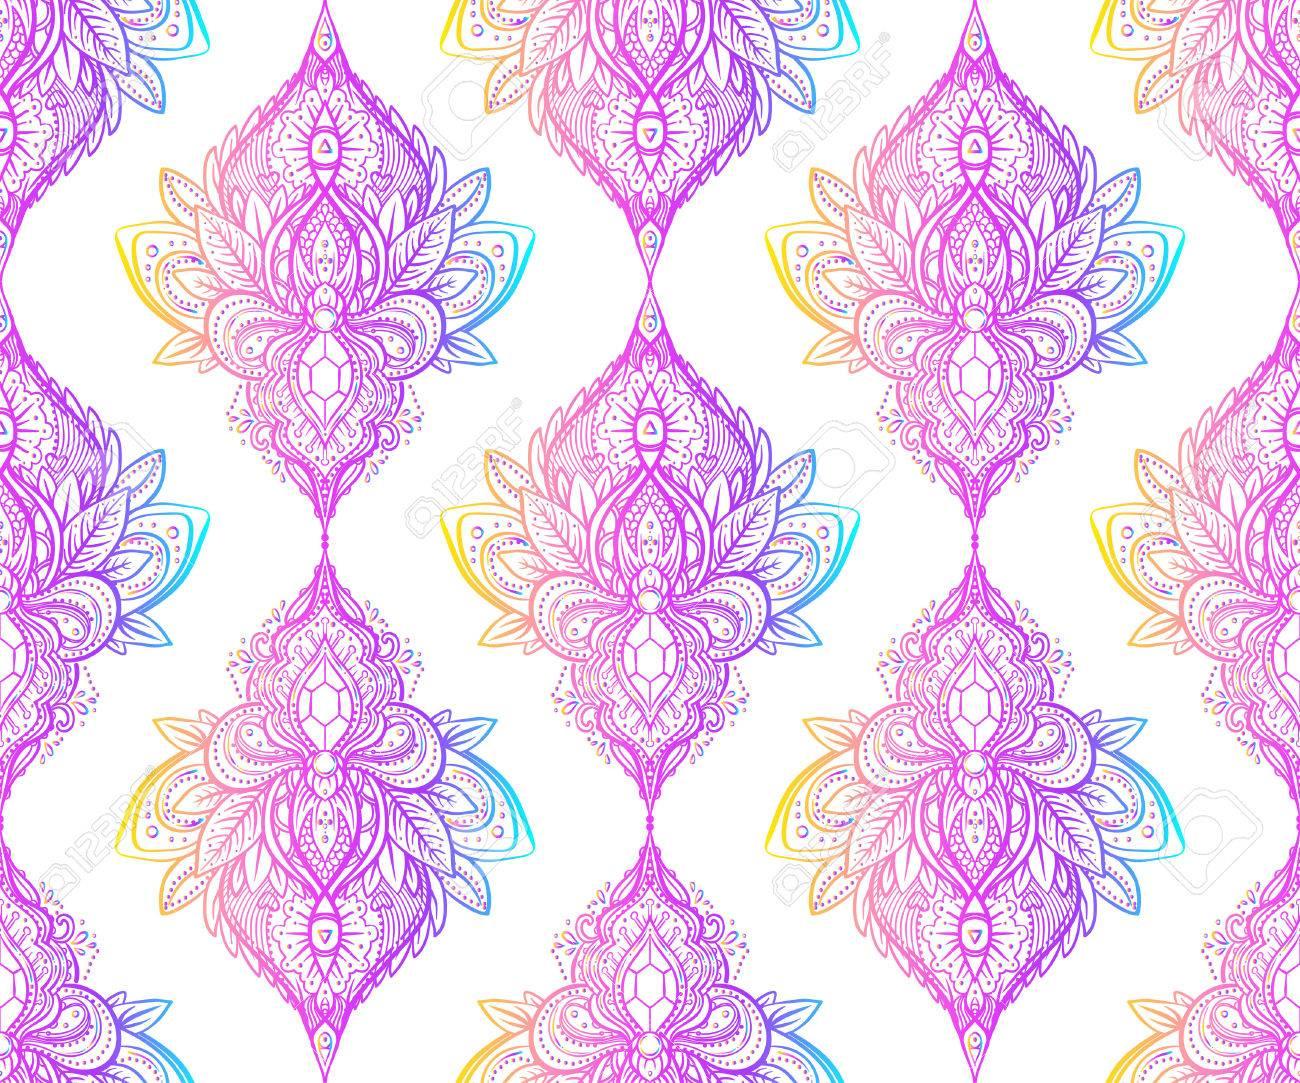 Vector ornamental Lotus flower, ethnic art, patterned Indian paisley. Hand drawn illustration. Invitation element. Tattoo, astrology, alchemy, boho and magic symbol. - 79141100